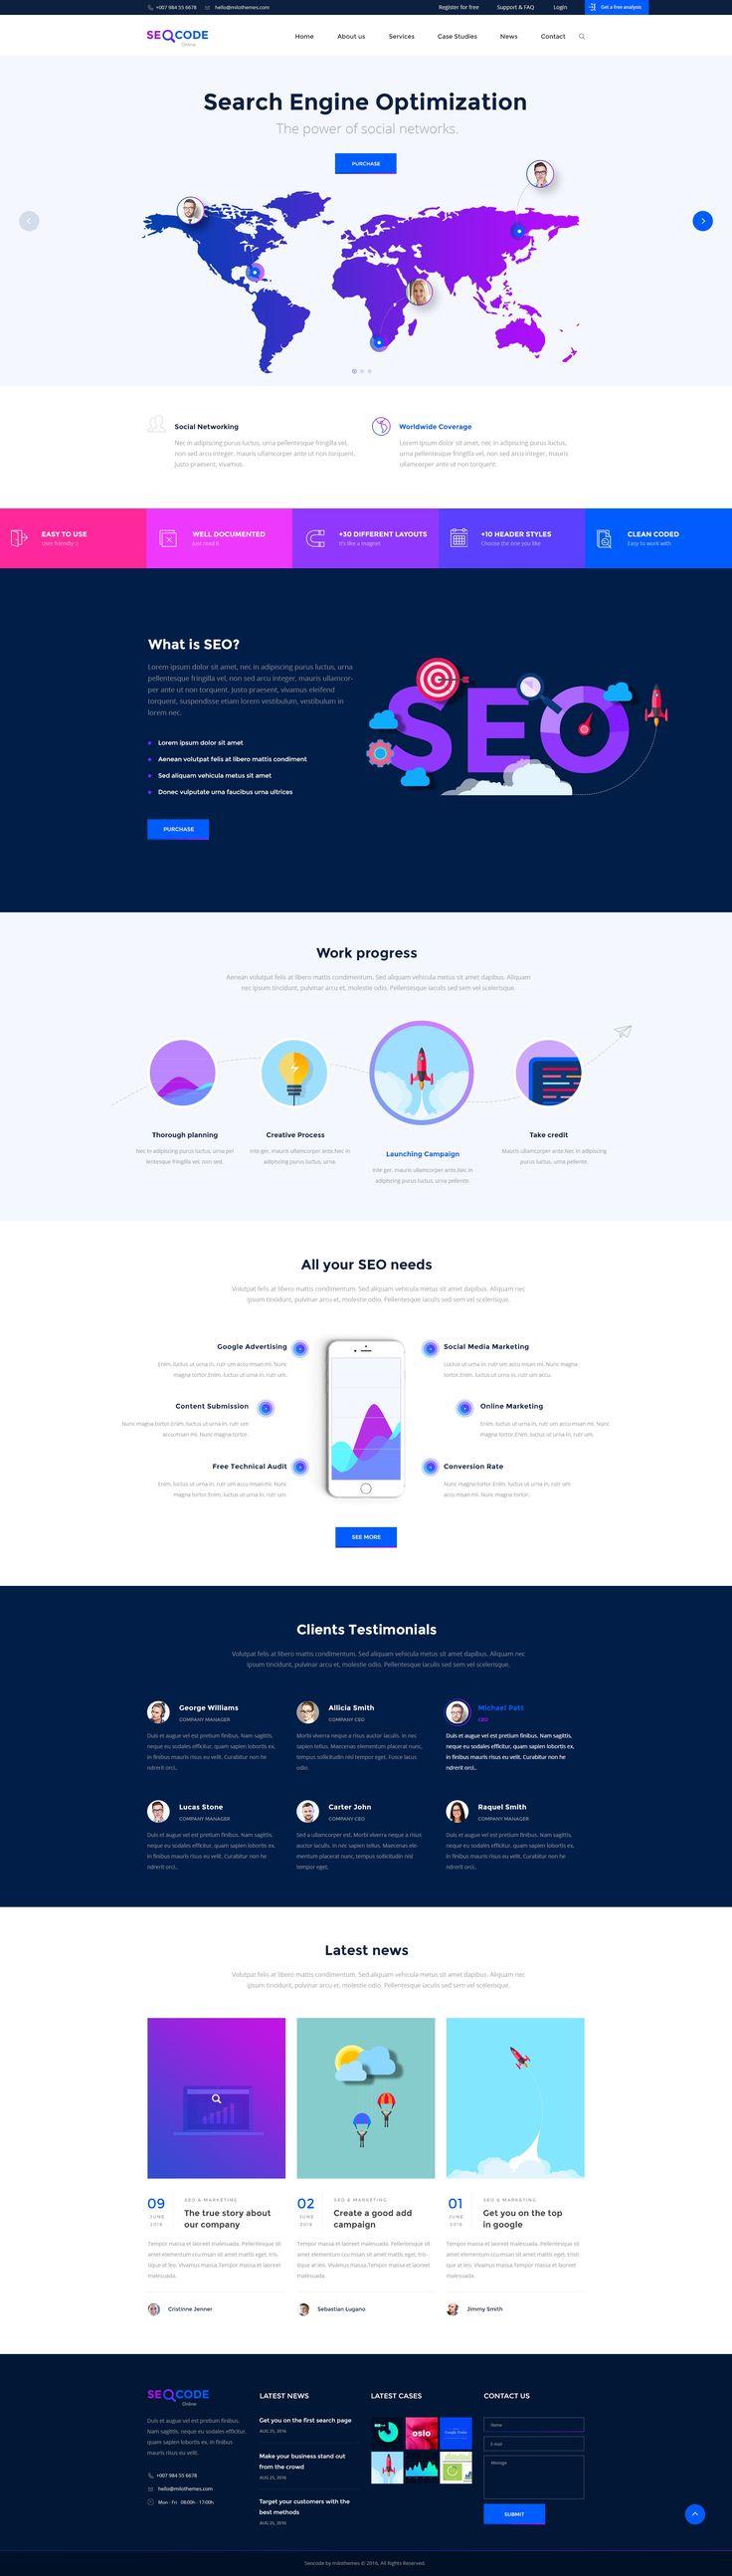 SeoCode - The Ultimate SEO & Online Marketing PSD Template Design